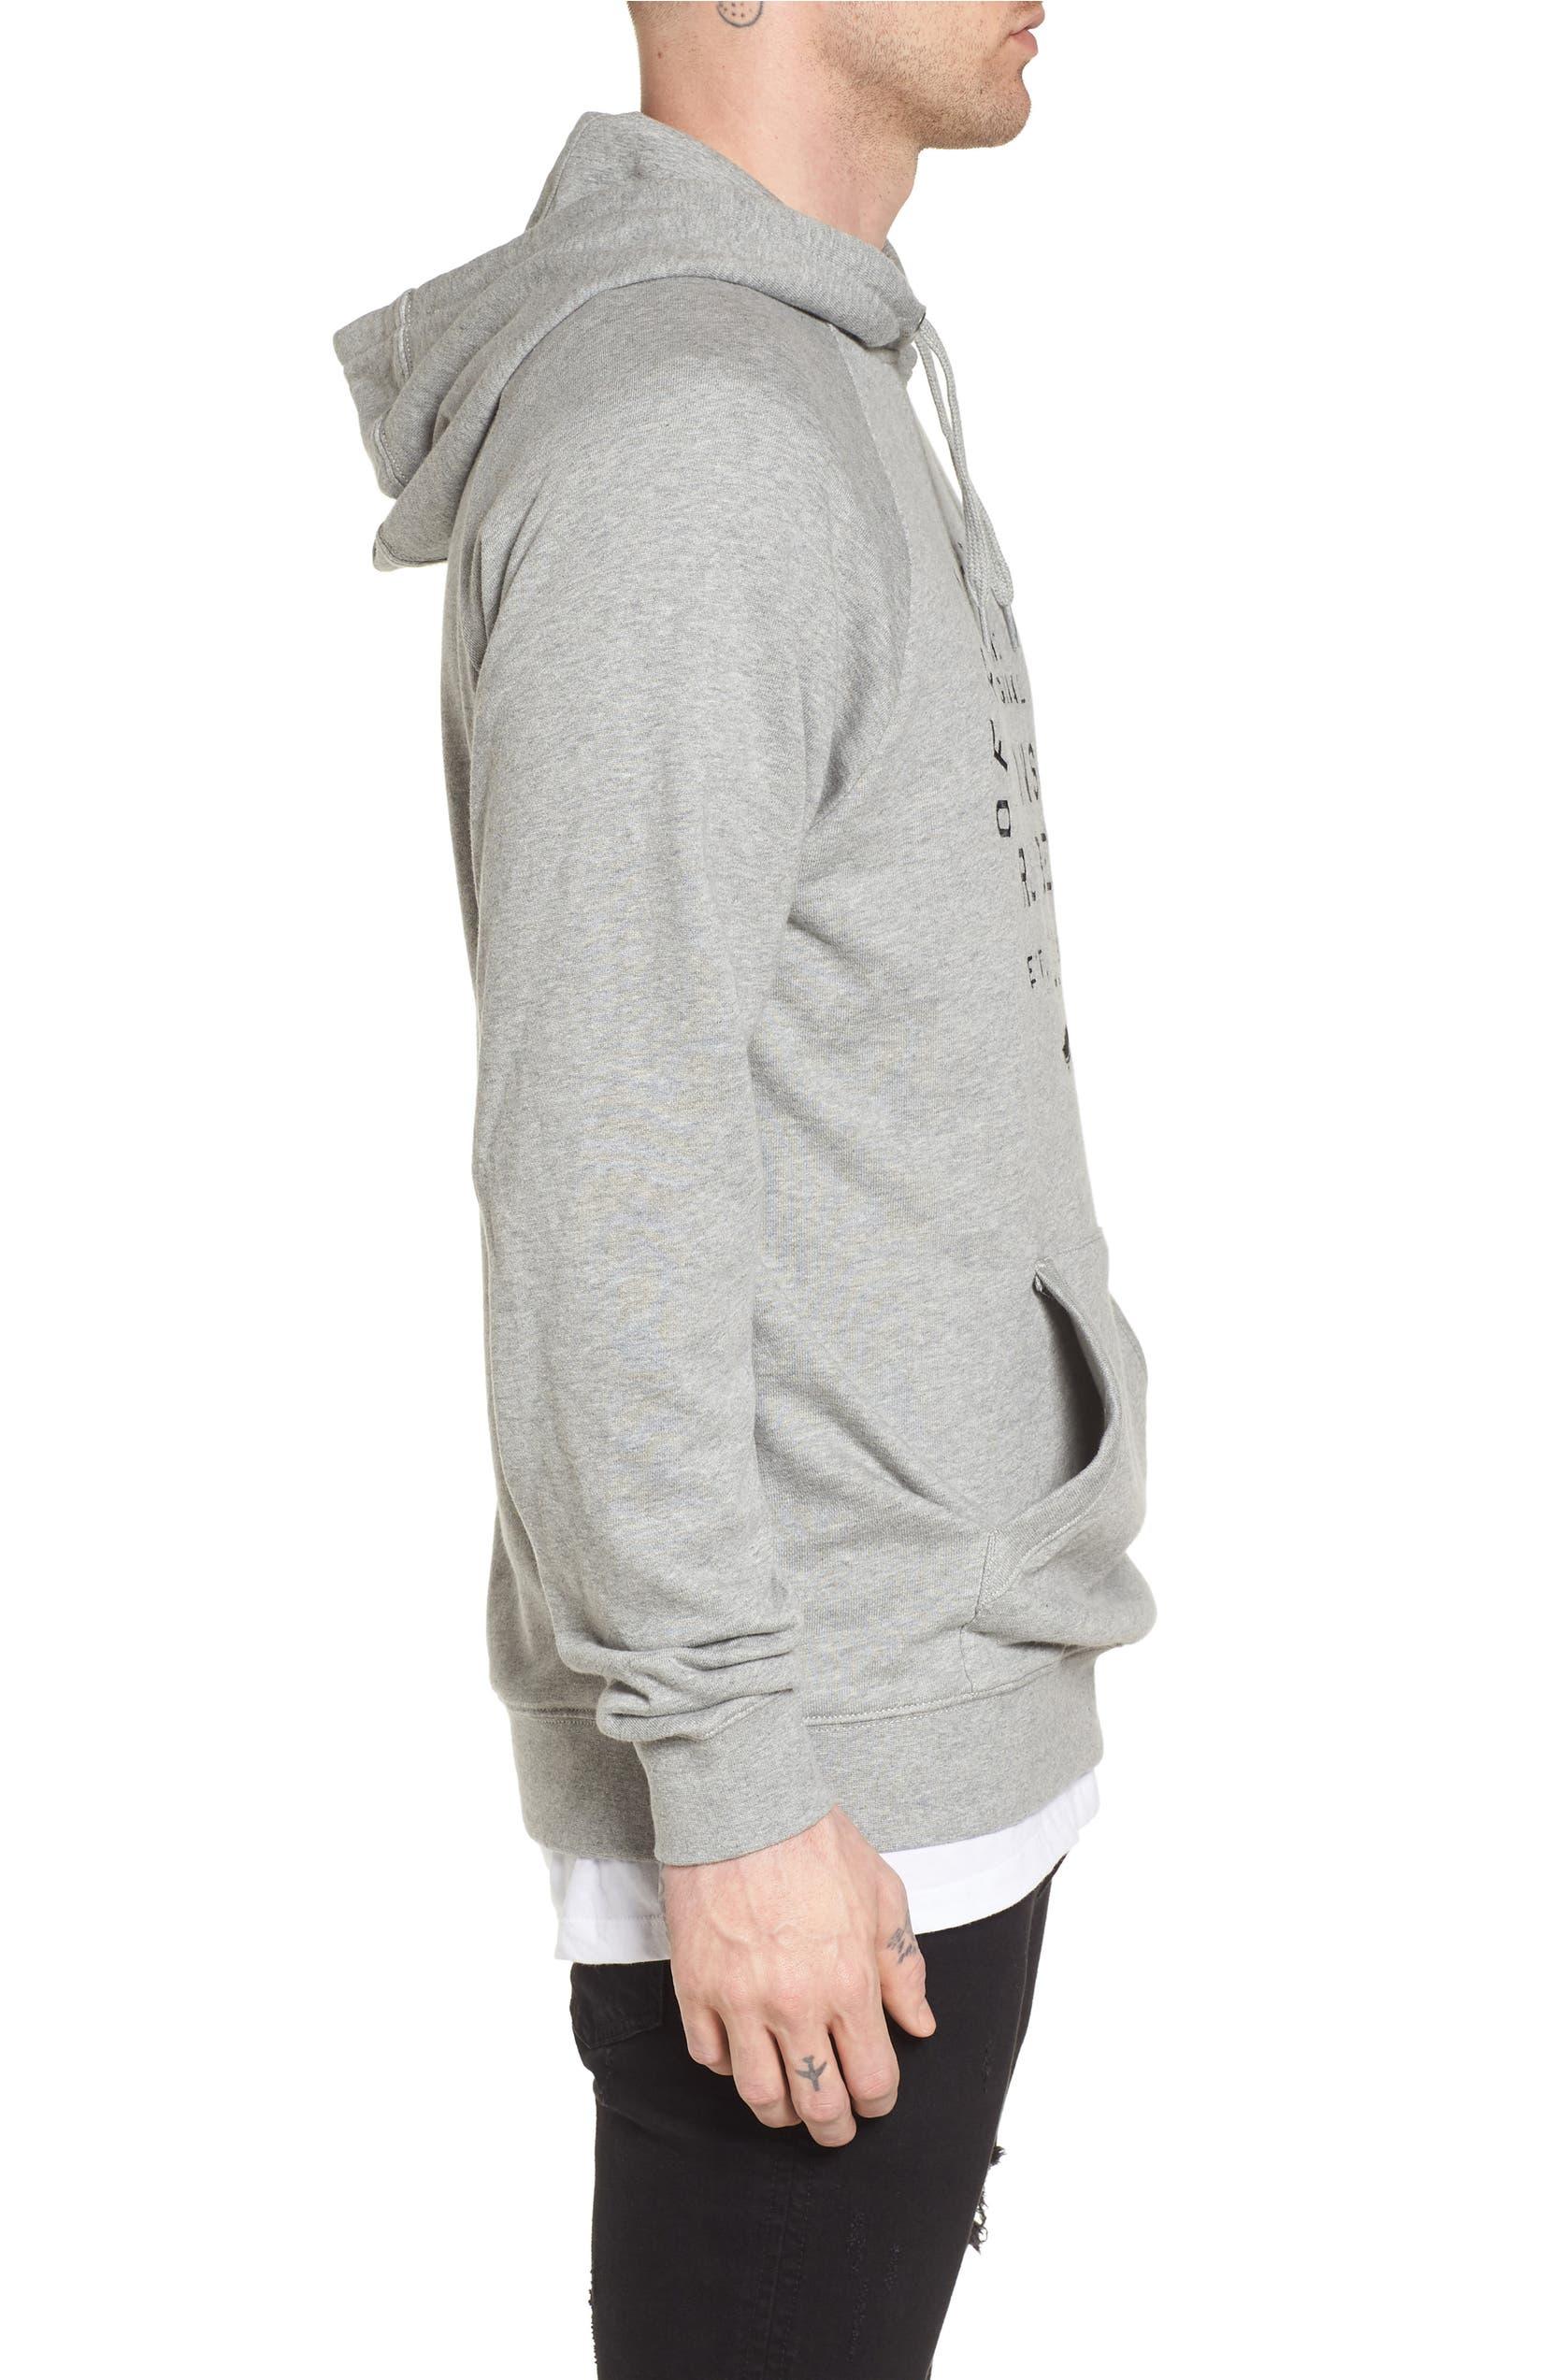 09aec85598 Vans Stacked Rubber Hoodie Sweatshirt